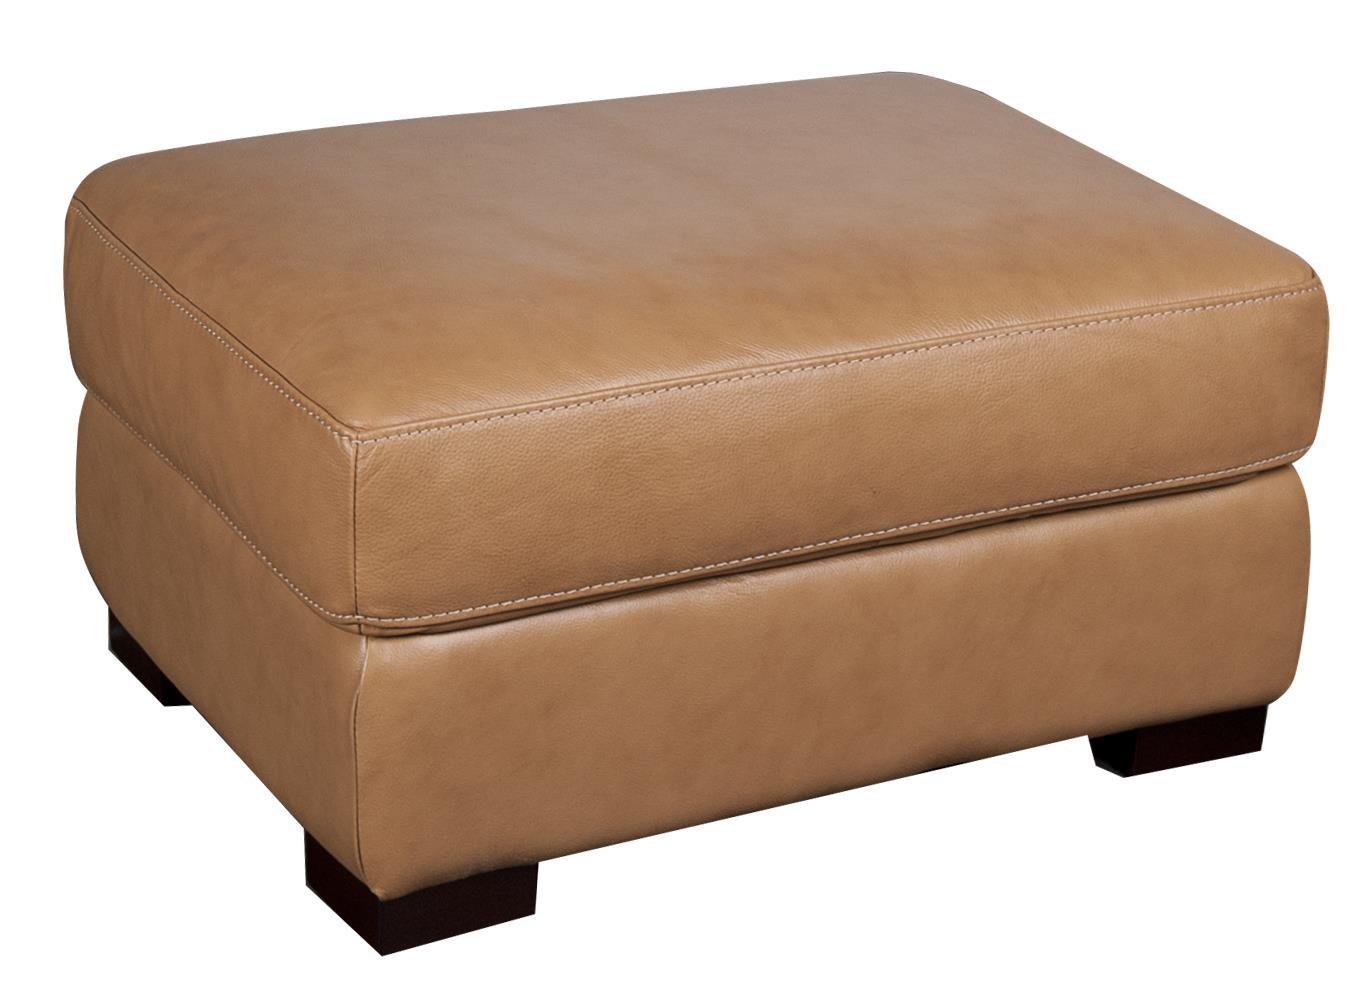 Morris Home Furnishings Titus Titus 100% Leather Ottoman - Item Number: 556660179